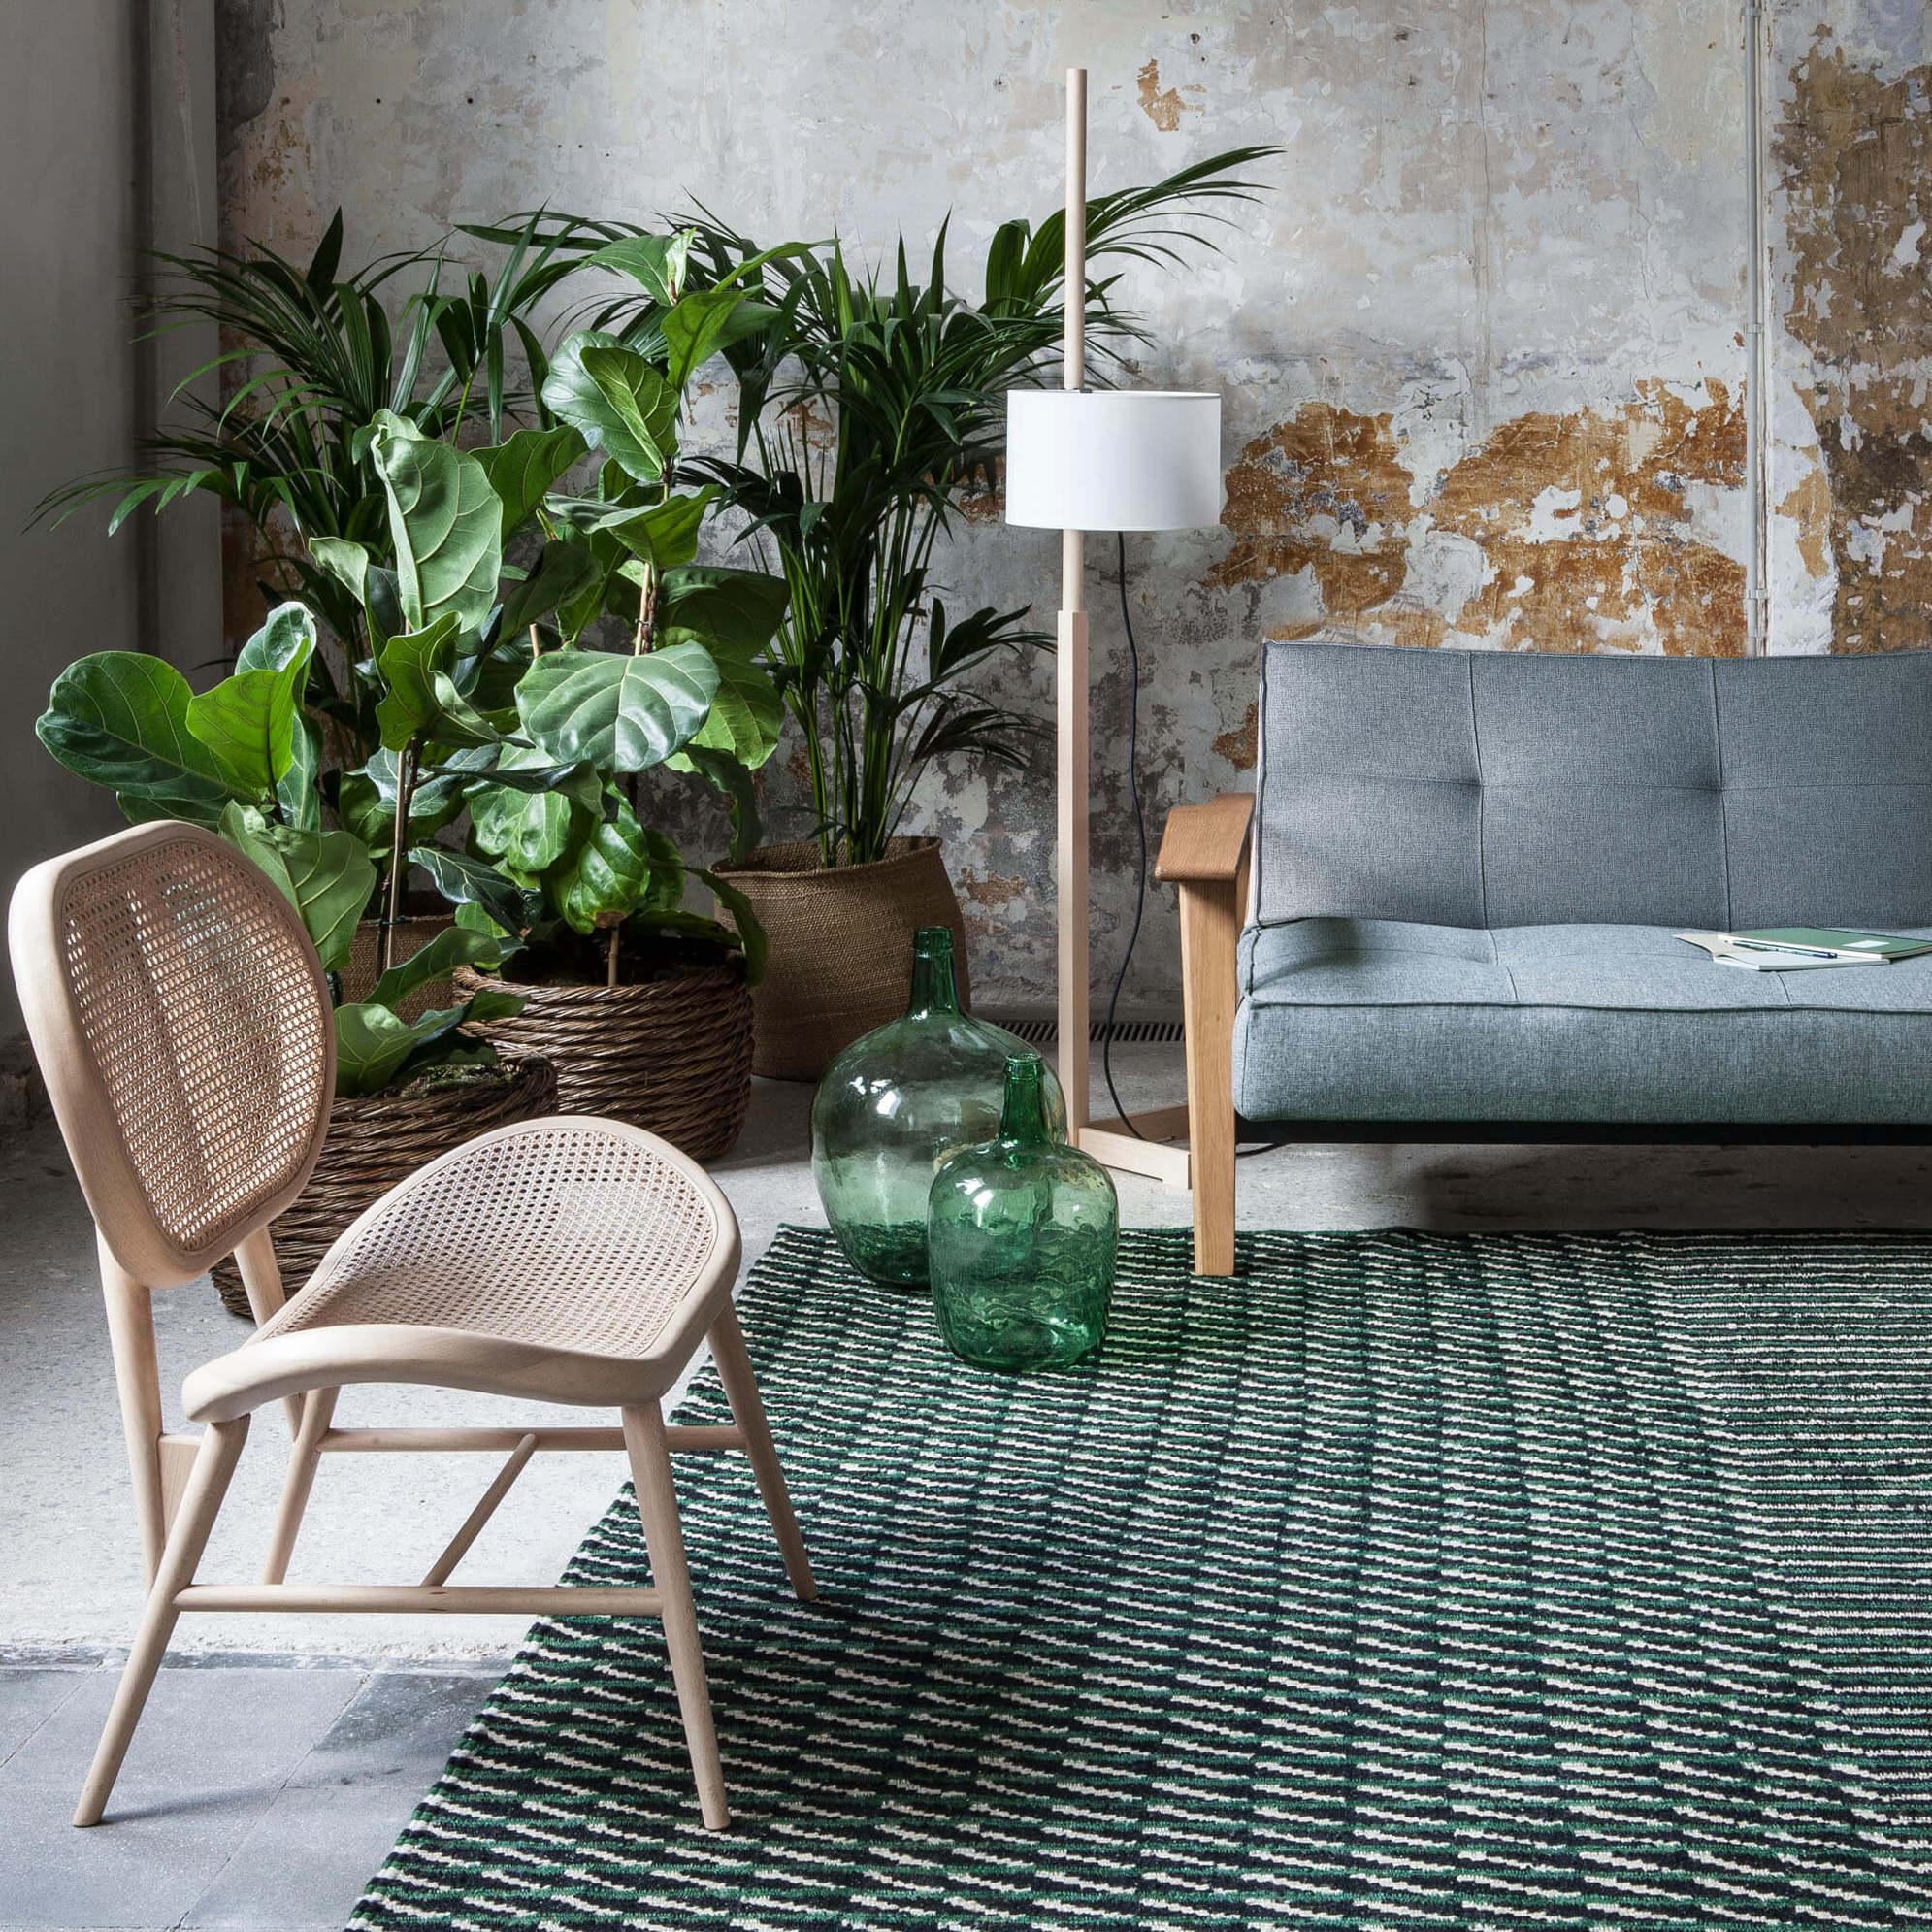 Ronan & Erwan Bouroullec nanimarquina – blur rug – design ronan & erwan bouroullec